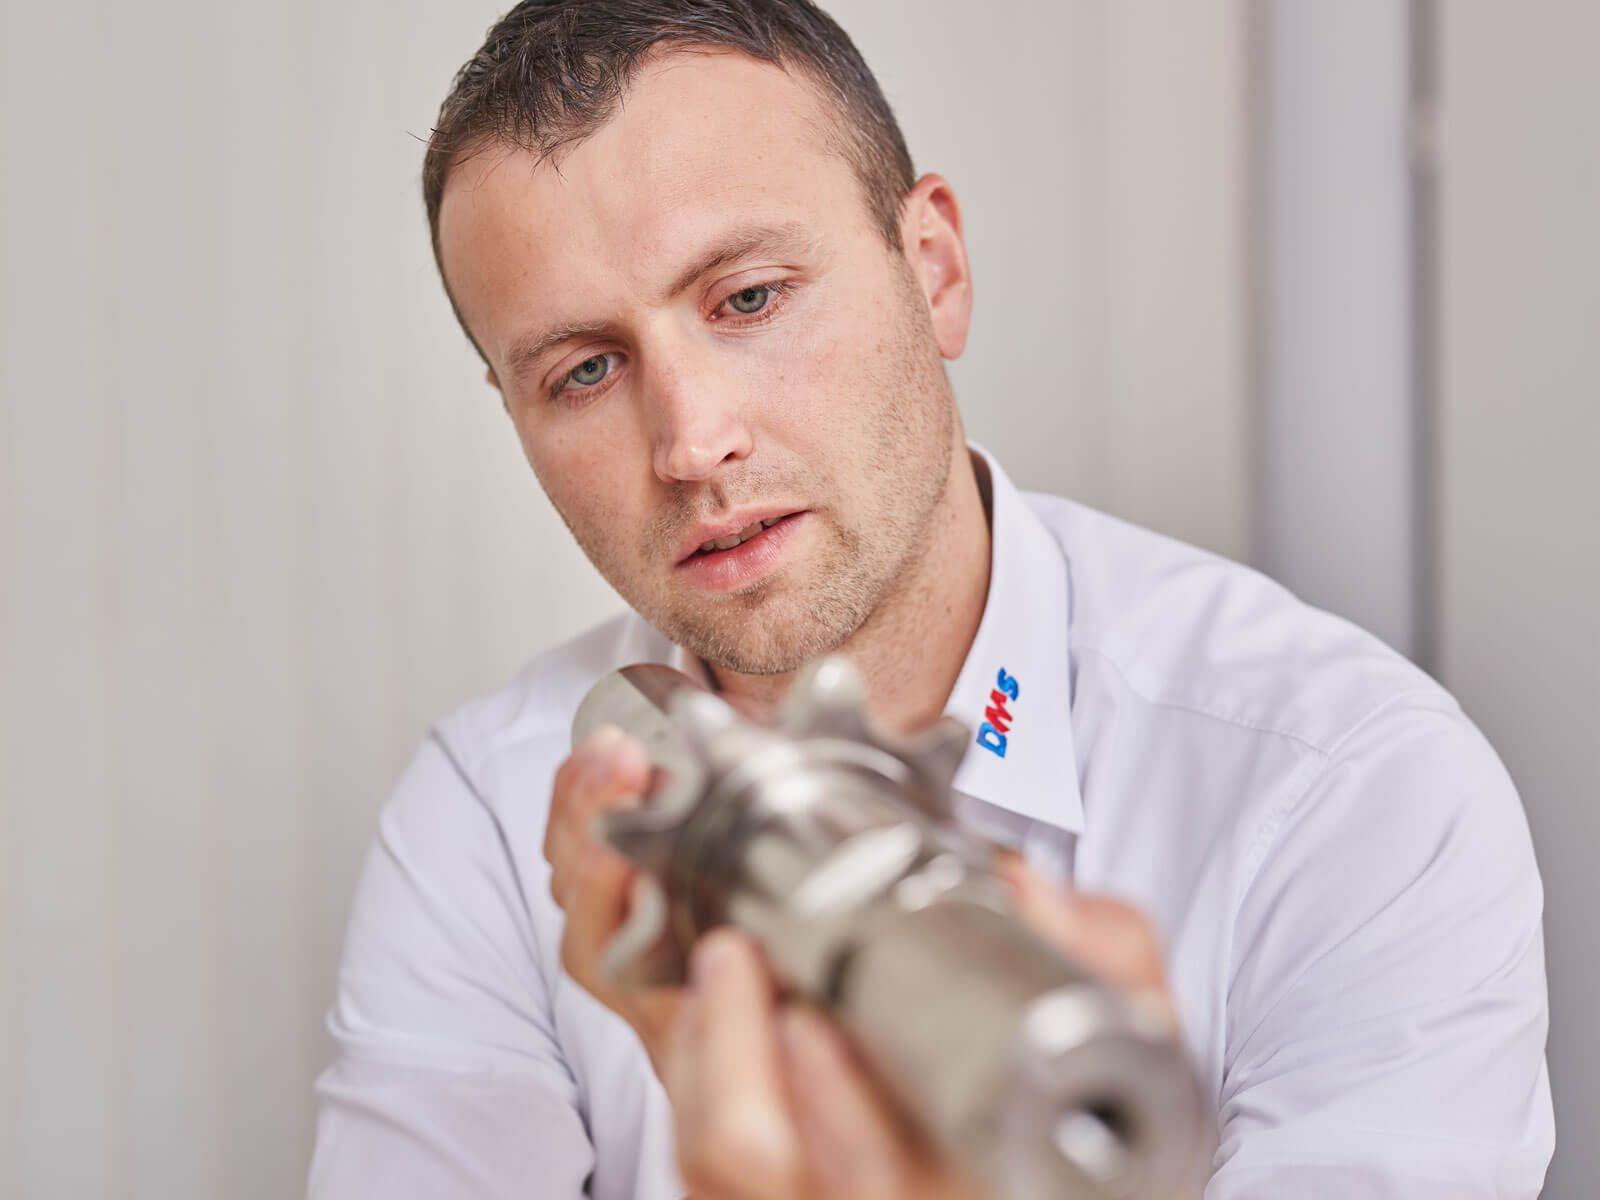 Seabstian Gruber, Vertriebsleiter DMS Technologie